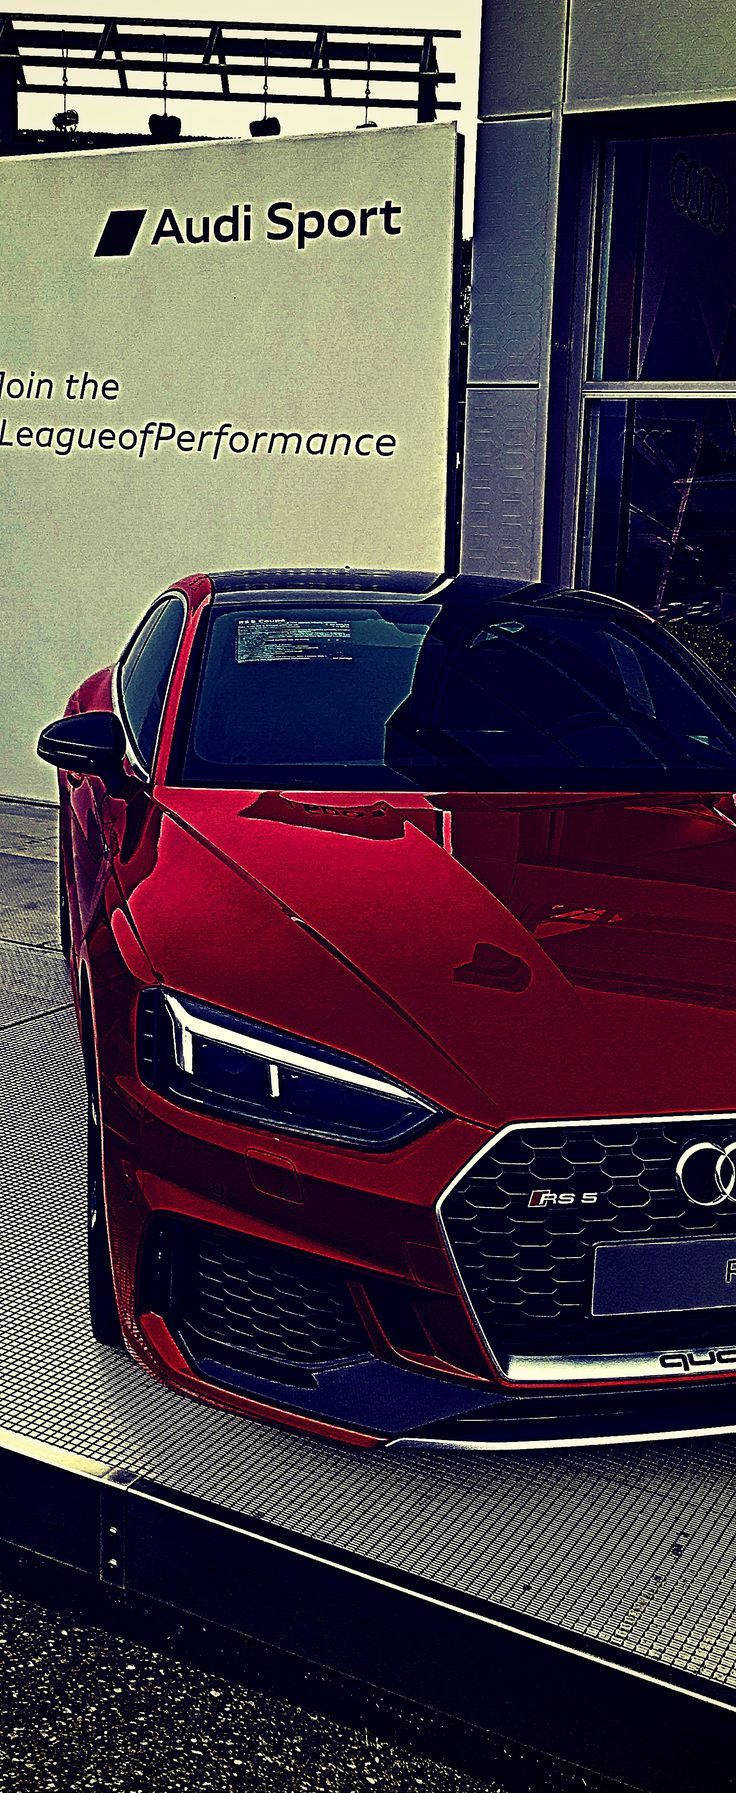 Audi RS5 Quattro http://amzn.to/2sqd2fG